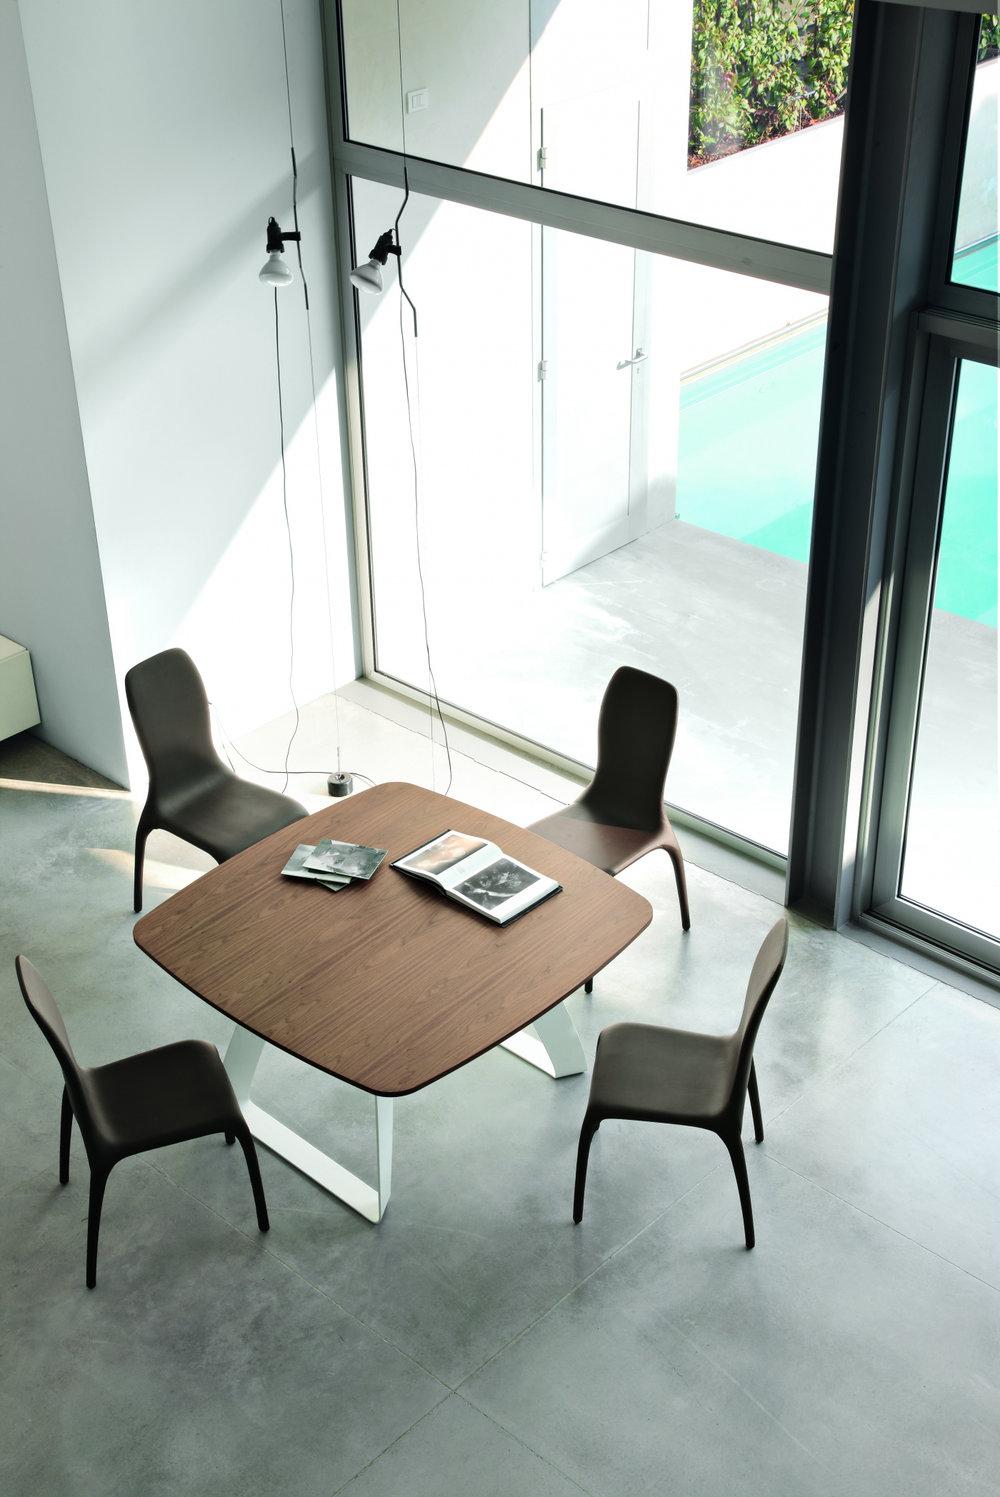 2_Стол деревянный квадратный Brenta Tonin il Tempo Киев.jpg